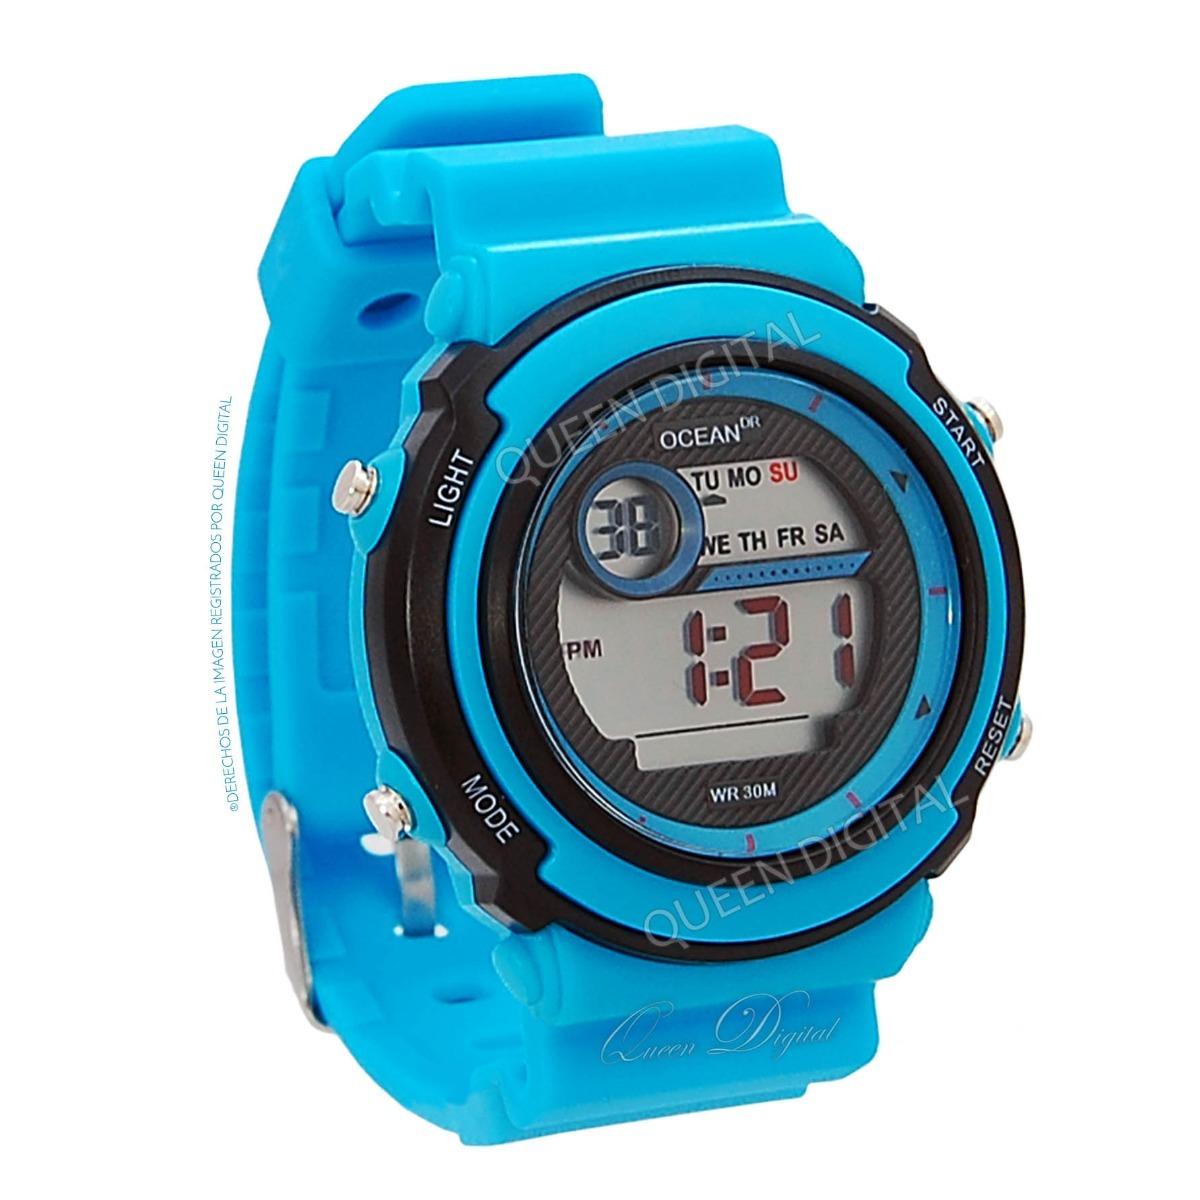 c9885b30f312 reloj deportivo niño niña sumergible 30m luz cronometro dama. Cargando zoom.